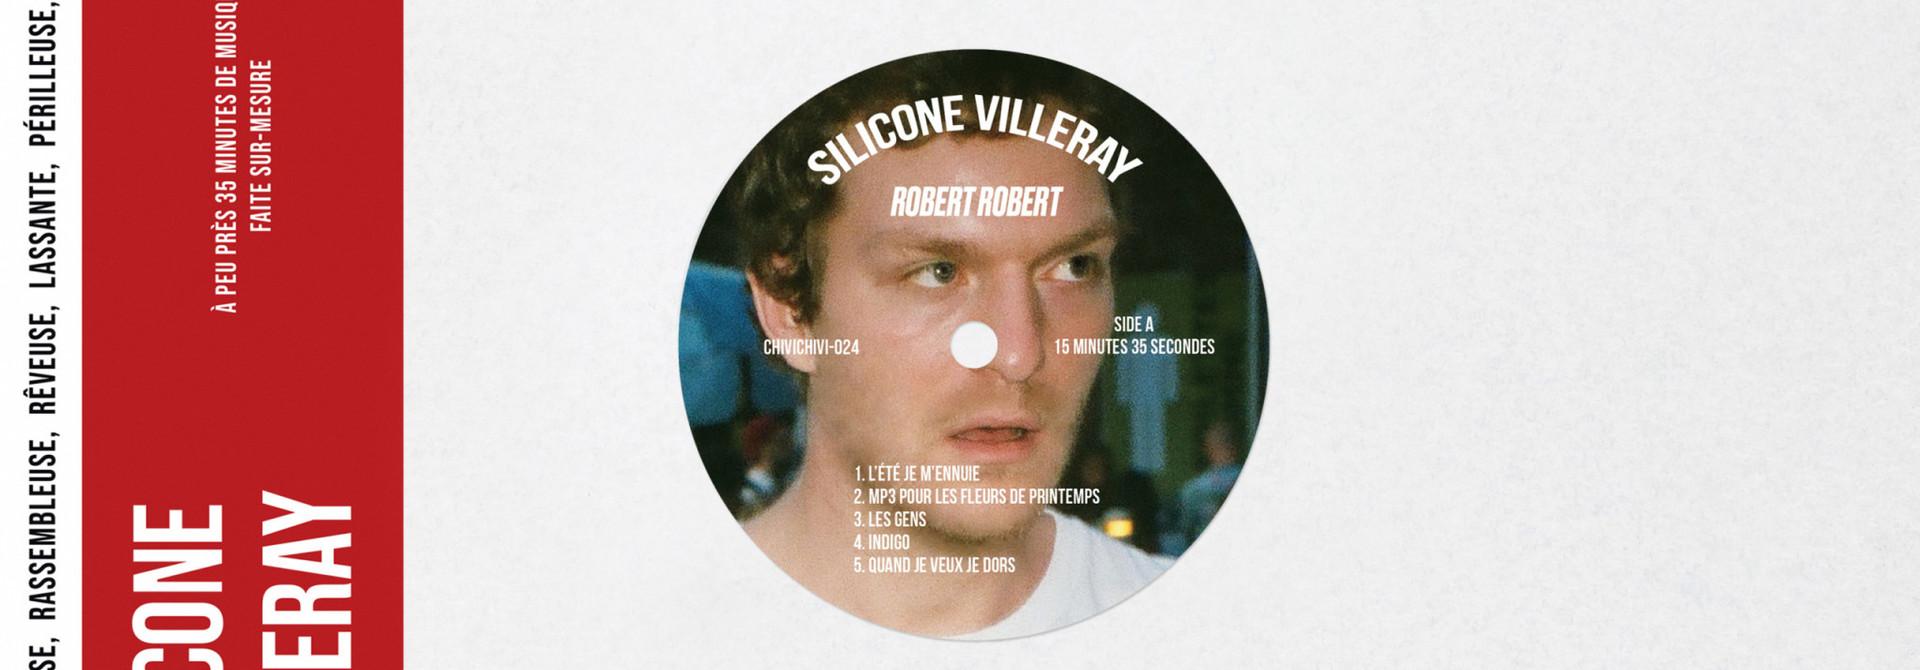 Robert Robert • Silicone Villeray